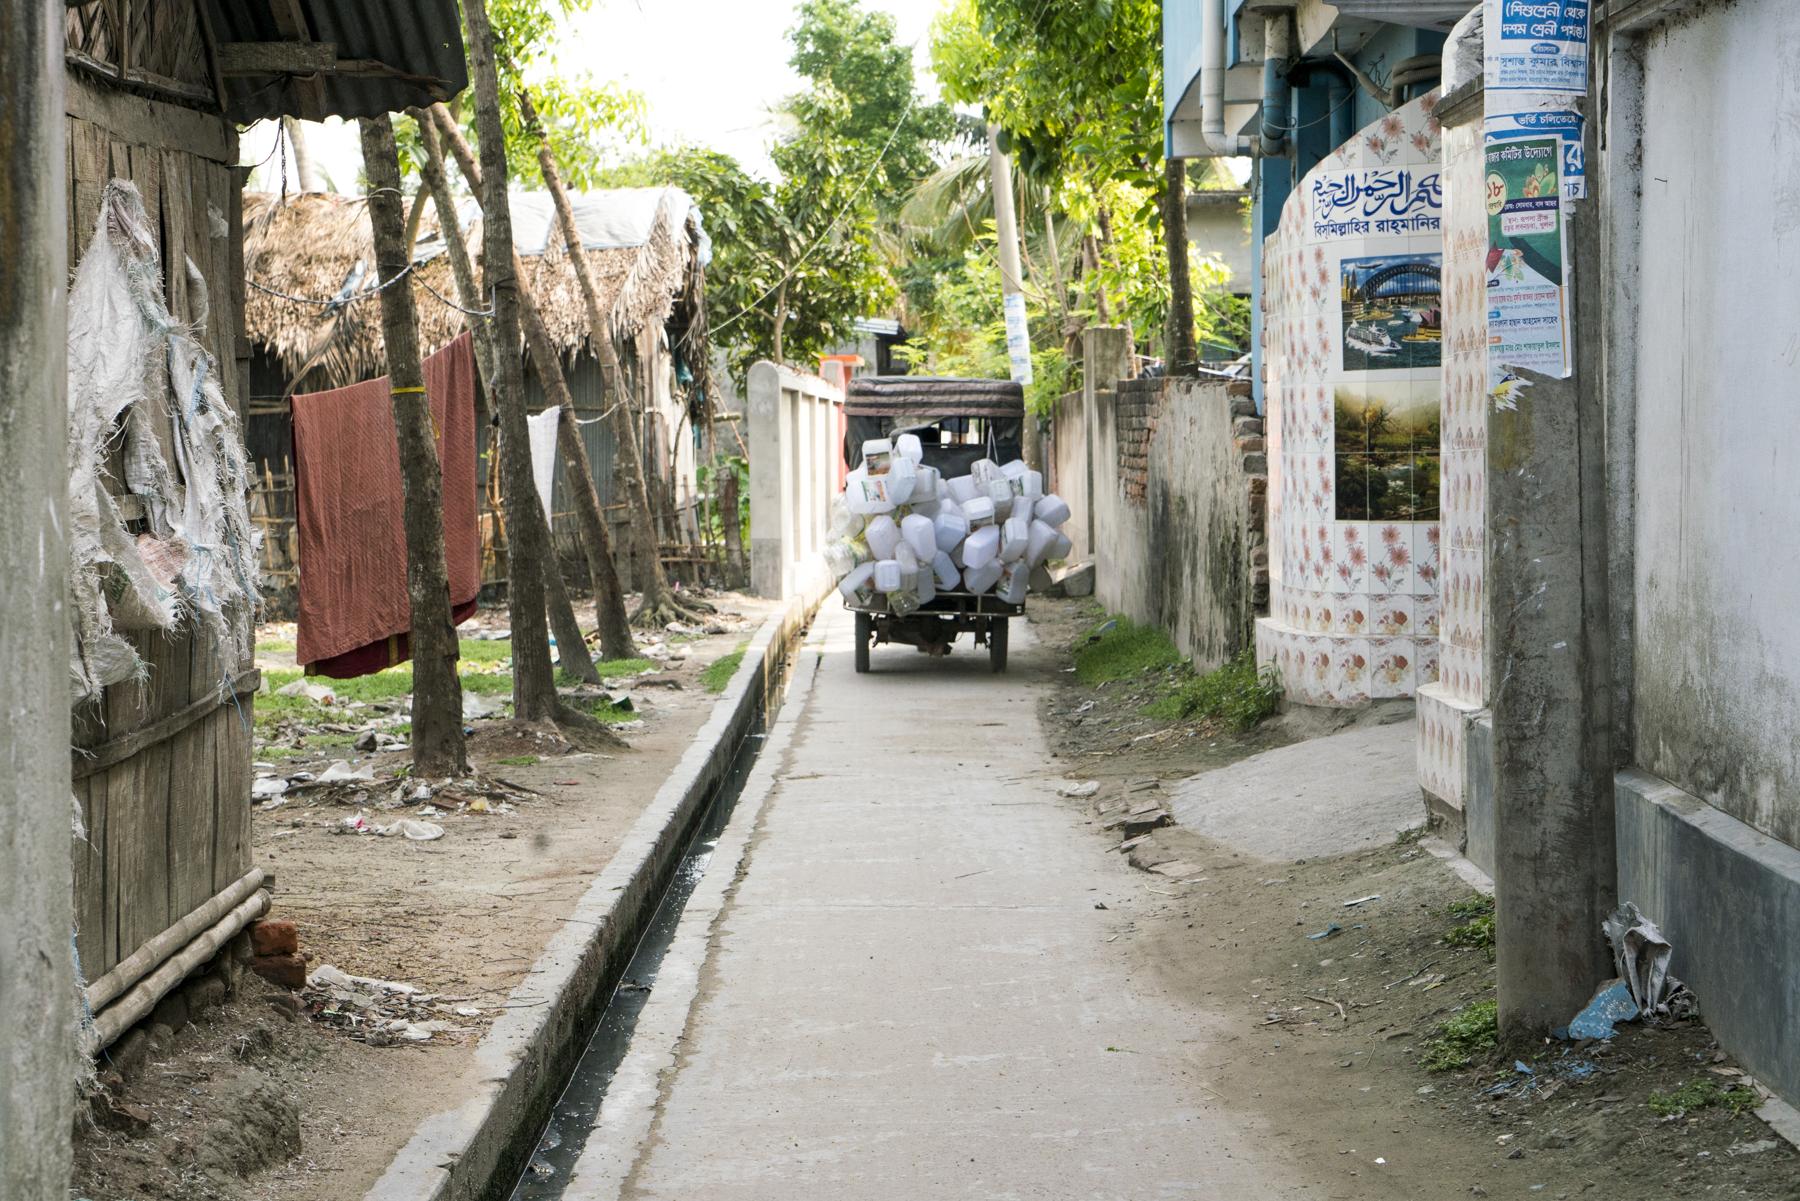 Abdulla's village